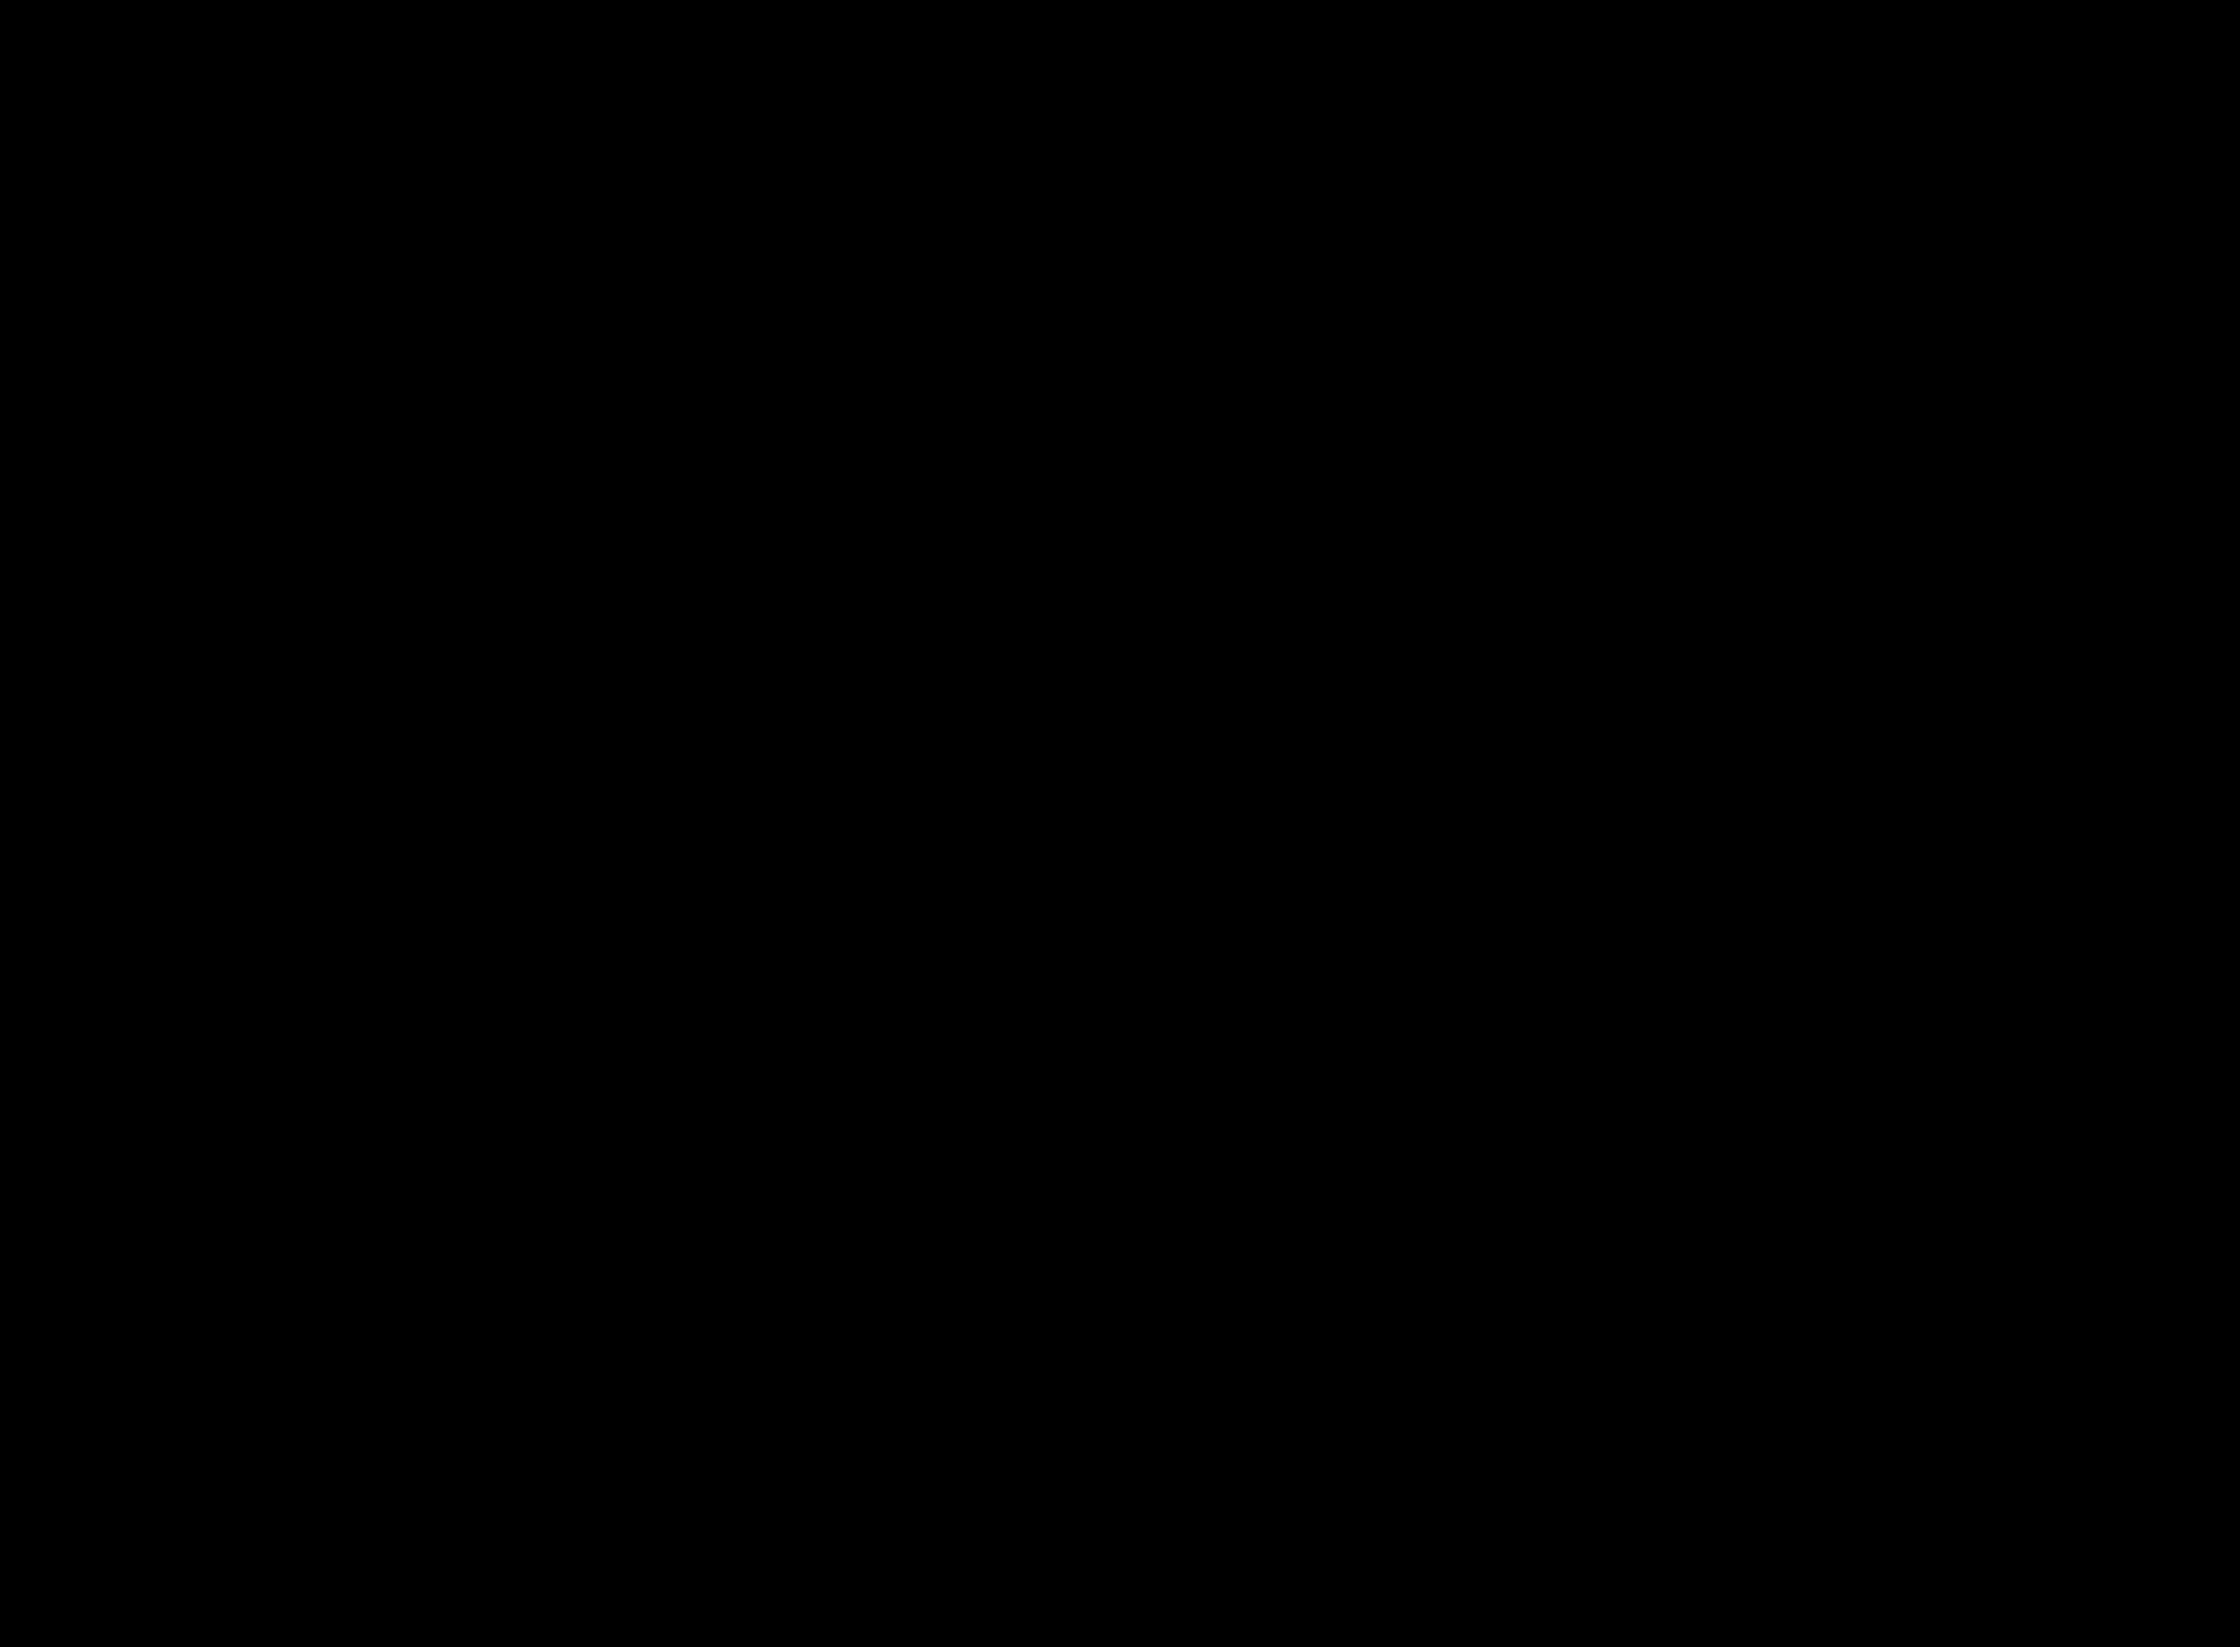 video camera silhouette at getdrawings com free for personal use rh getdrawings com video camera clipart png video camera clipart transparent